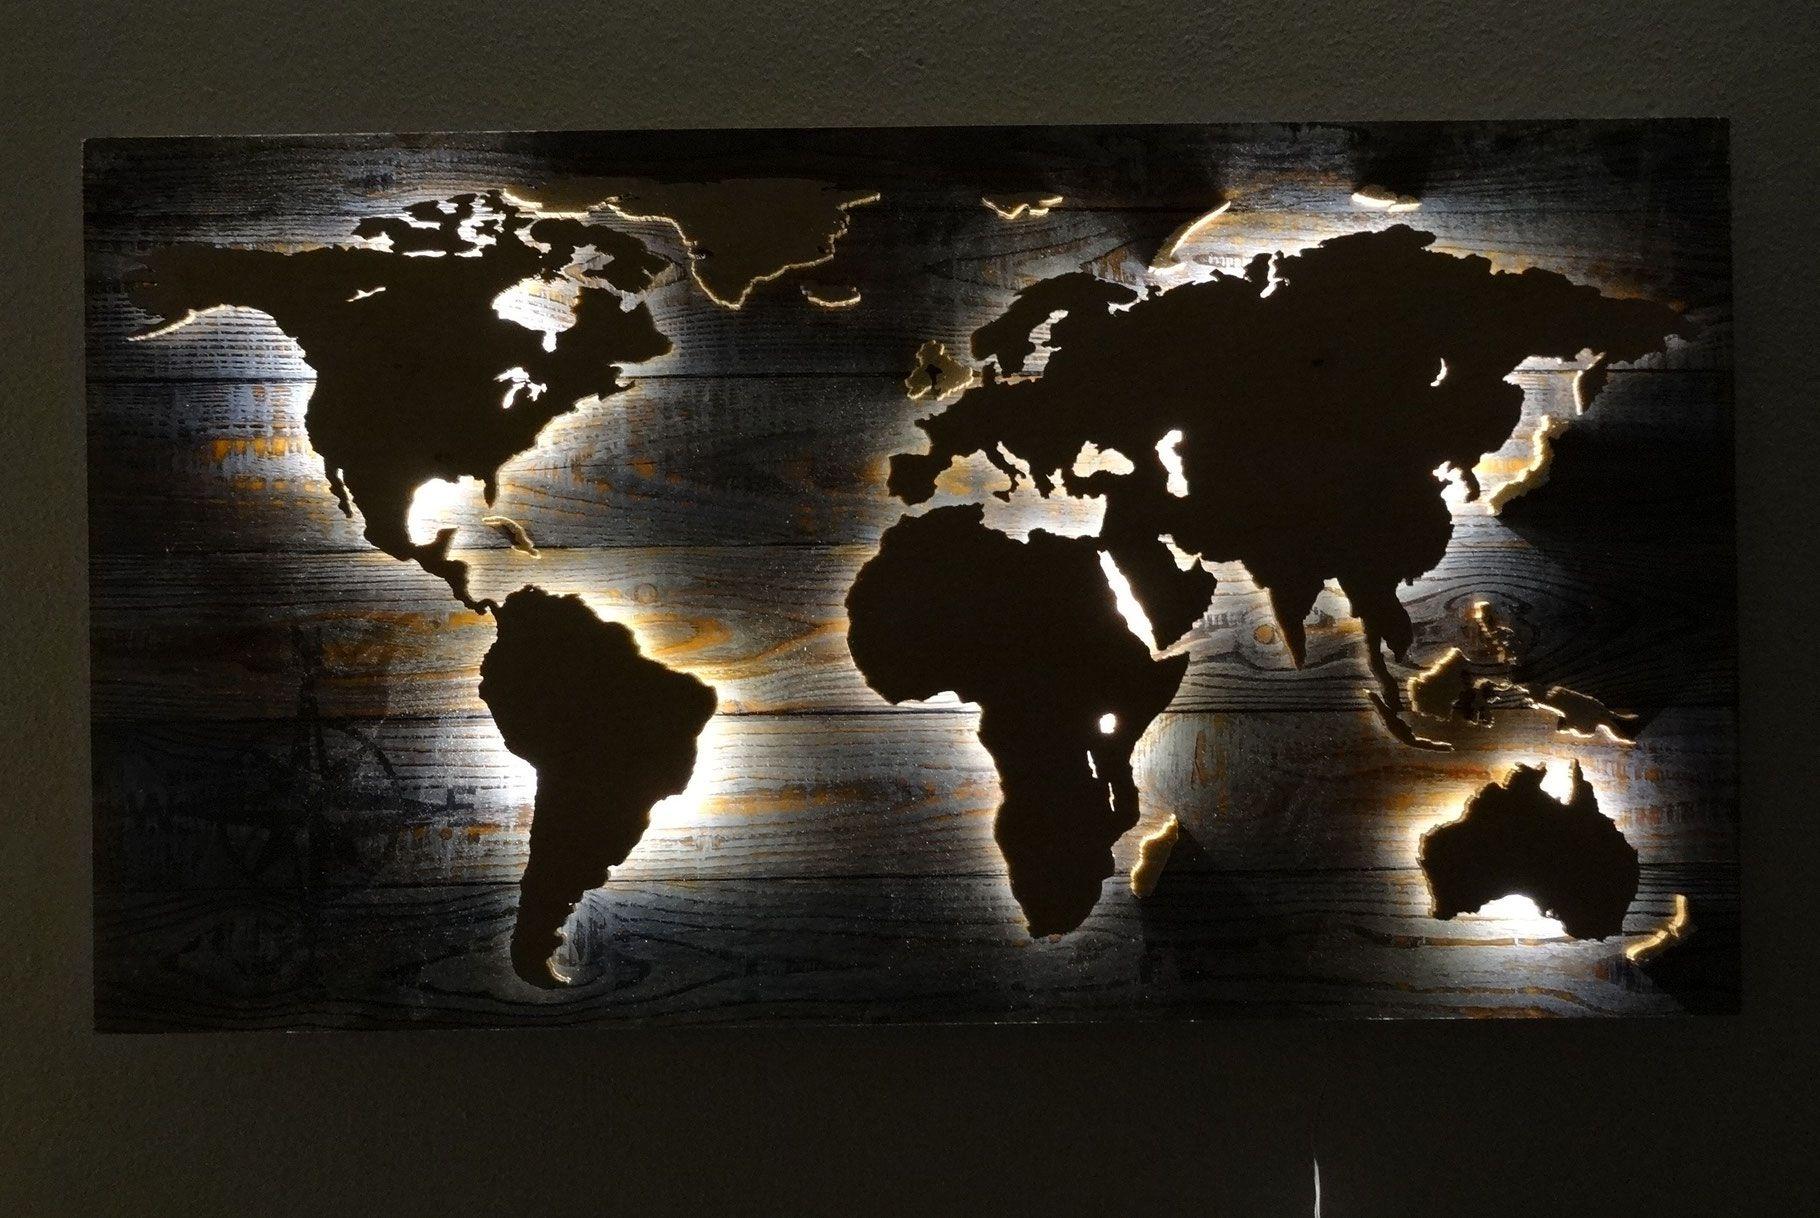 Weltkarte Aus Holz Led Beleuchtung Windrose Vintage Blau Ab 299 80 Weltkarte Aus Holz Weltkarte Windrose